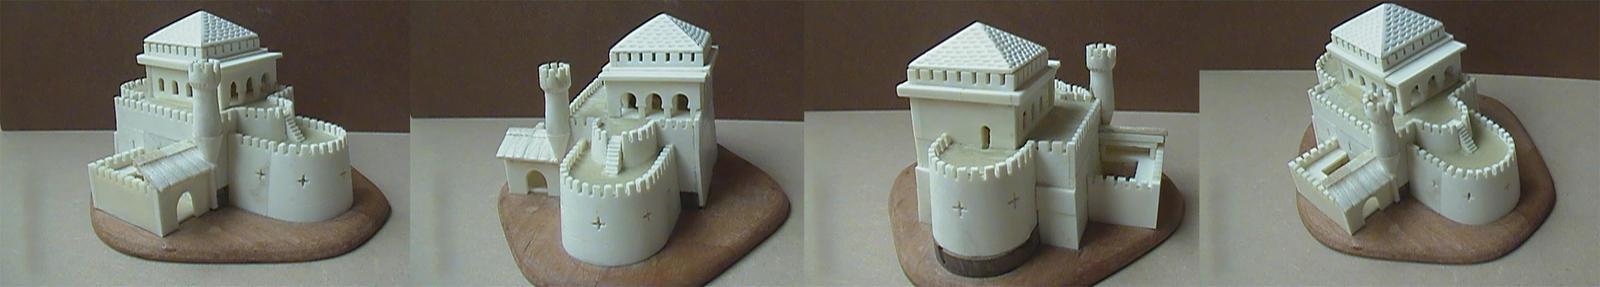 Bone Castle 06 by ClaudioTurcovich